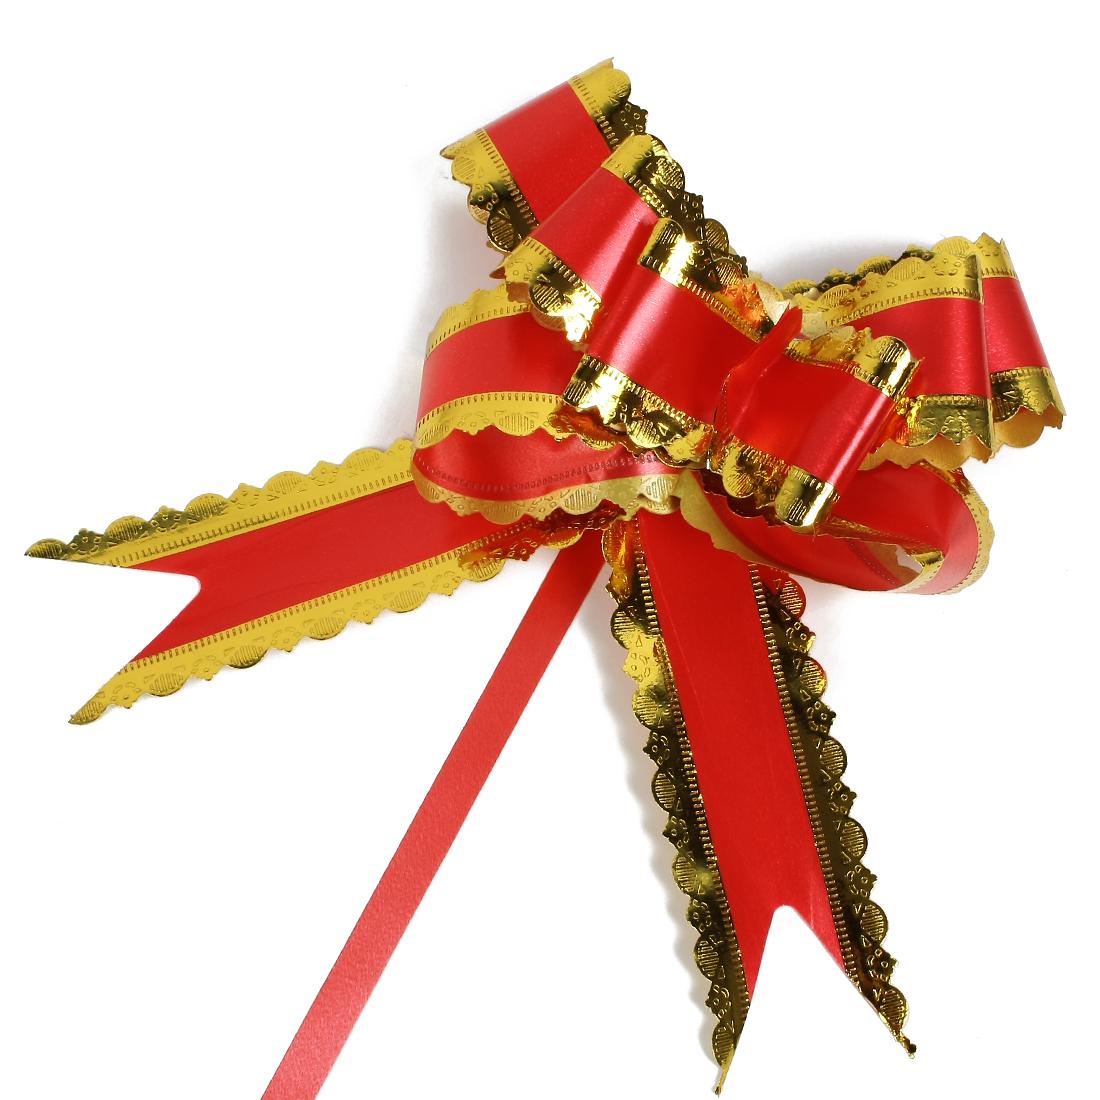 Wedding Bridal Party Gift Box Ribbon Pull Bows Decoration Red 5cm Width 10pcs